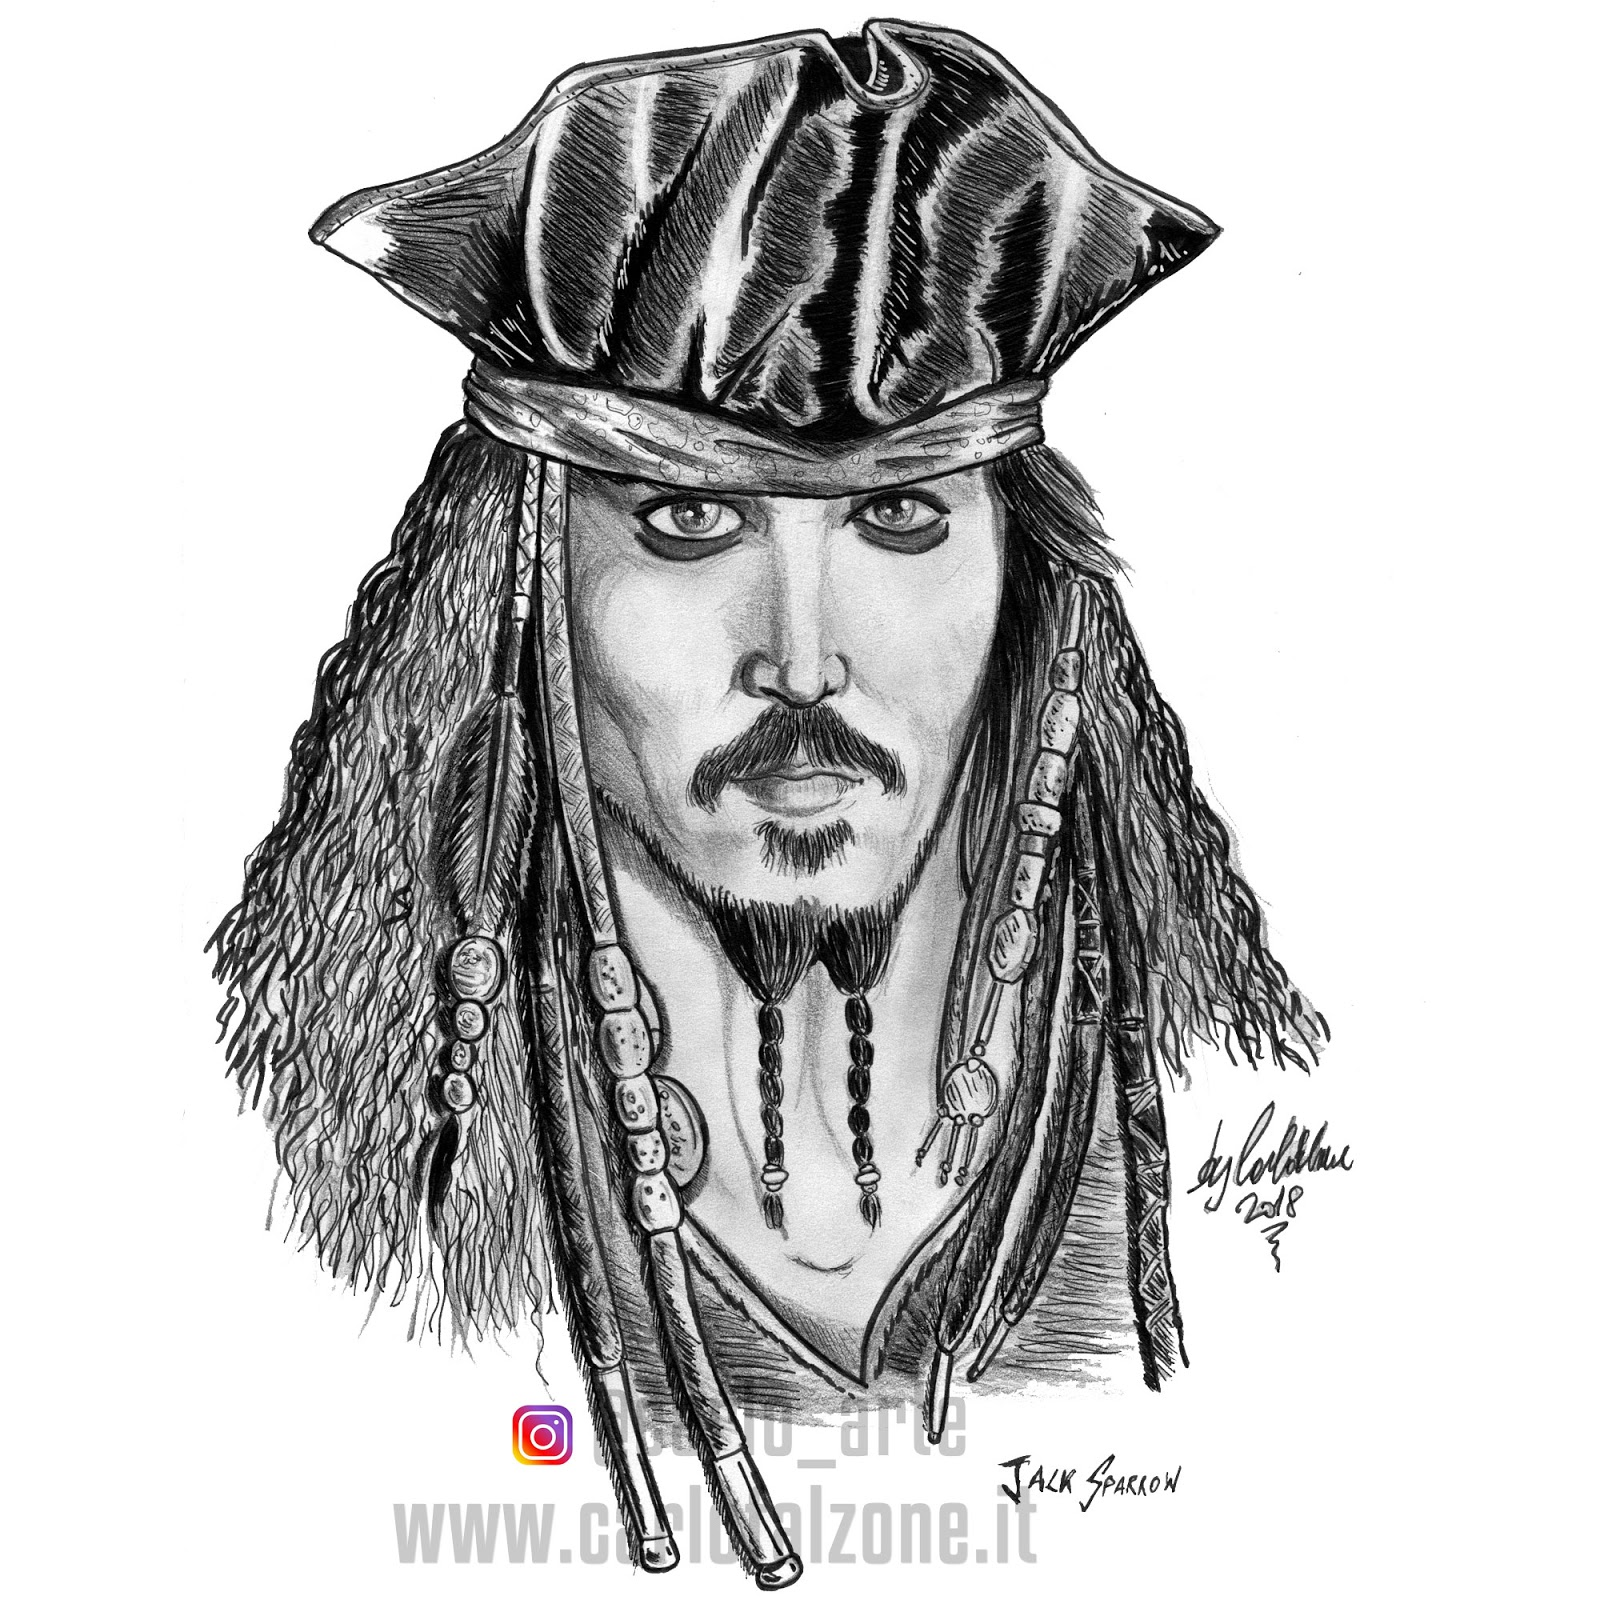 Pirati Dei Caraibi Disegno.Carlo Falzone Jack Sparrow Da I Pirati Dei Caraibi